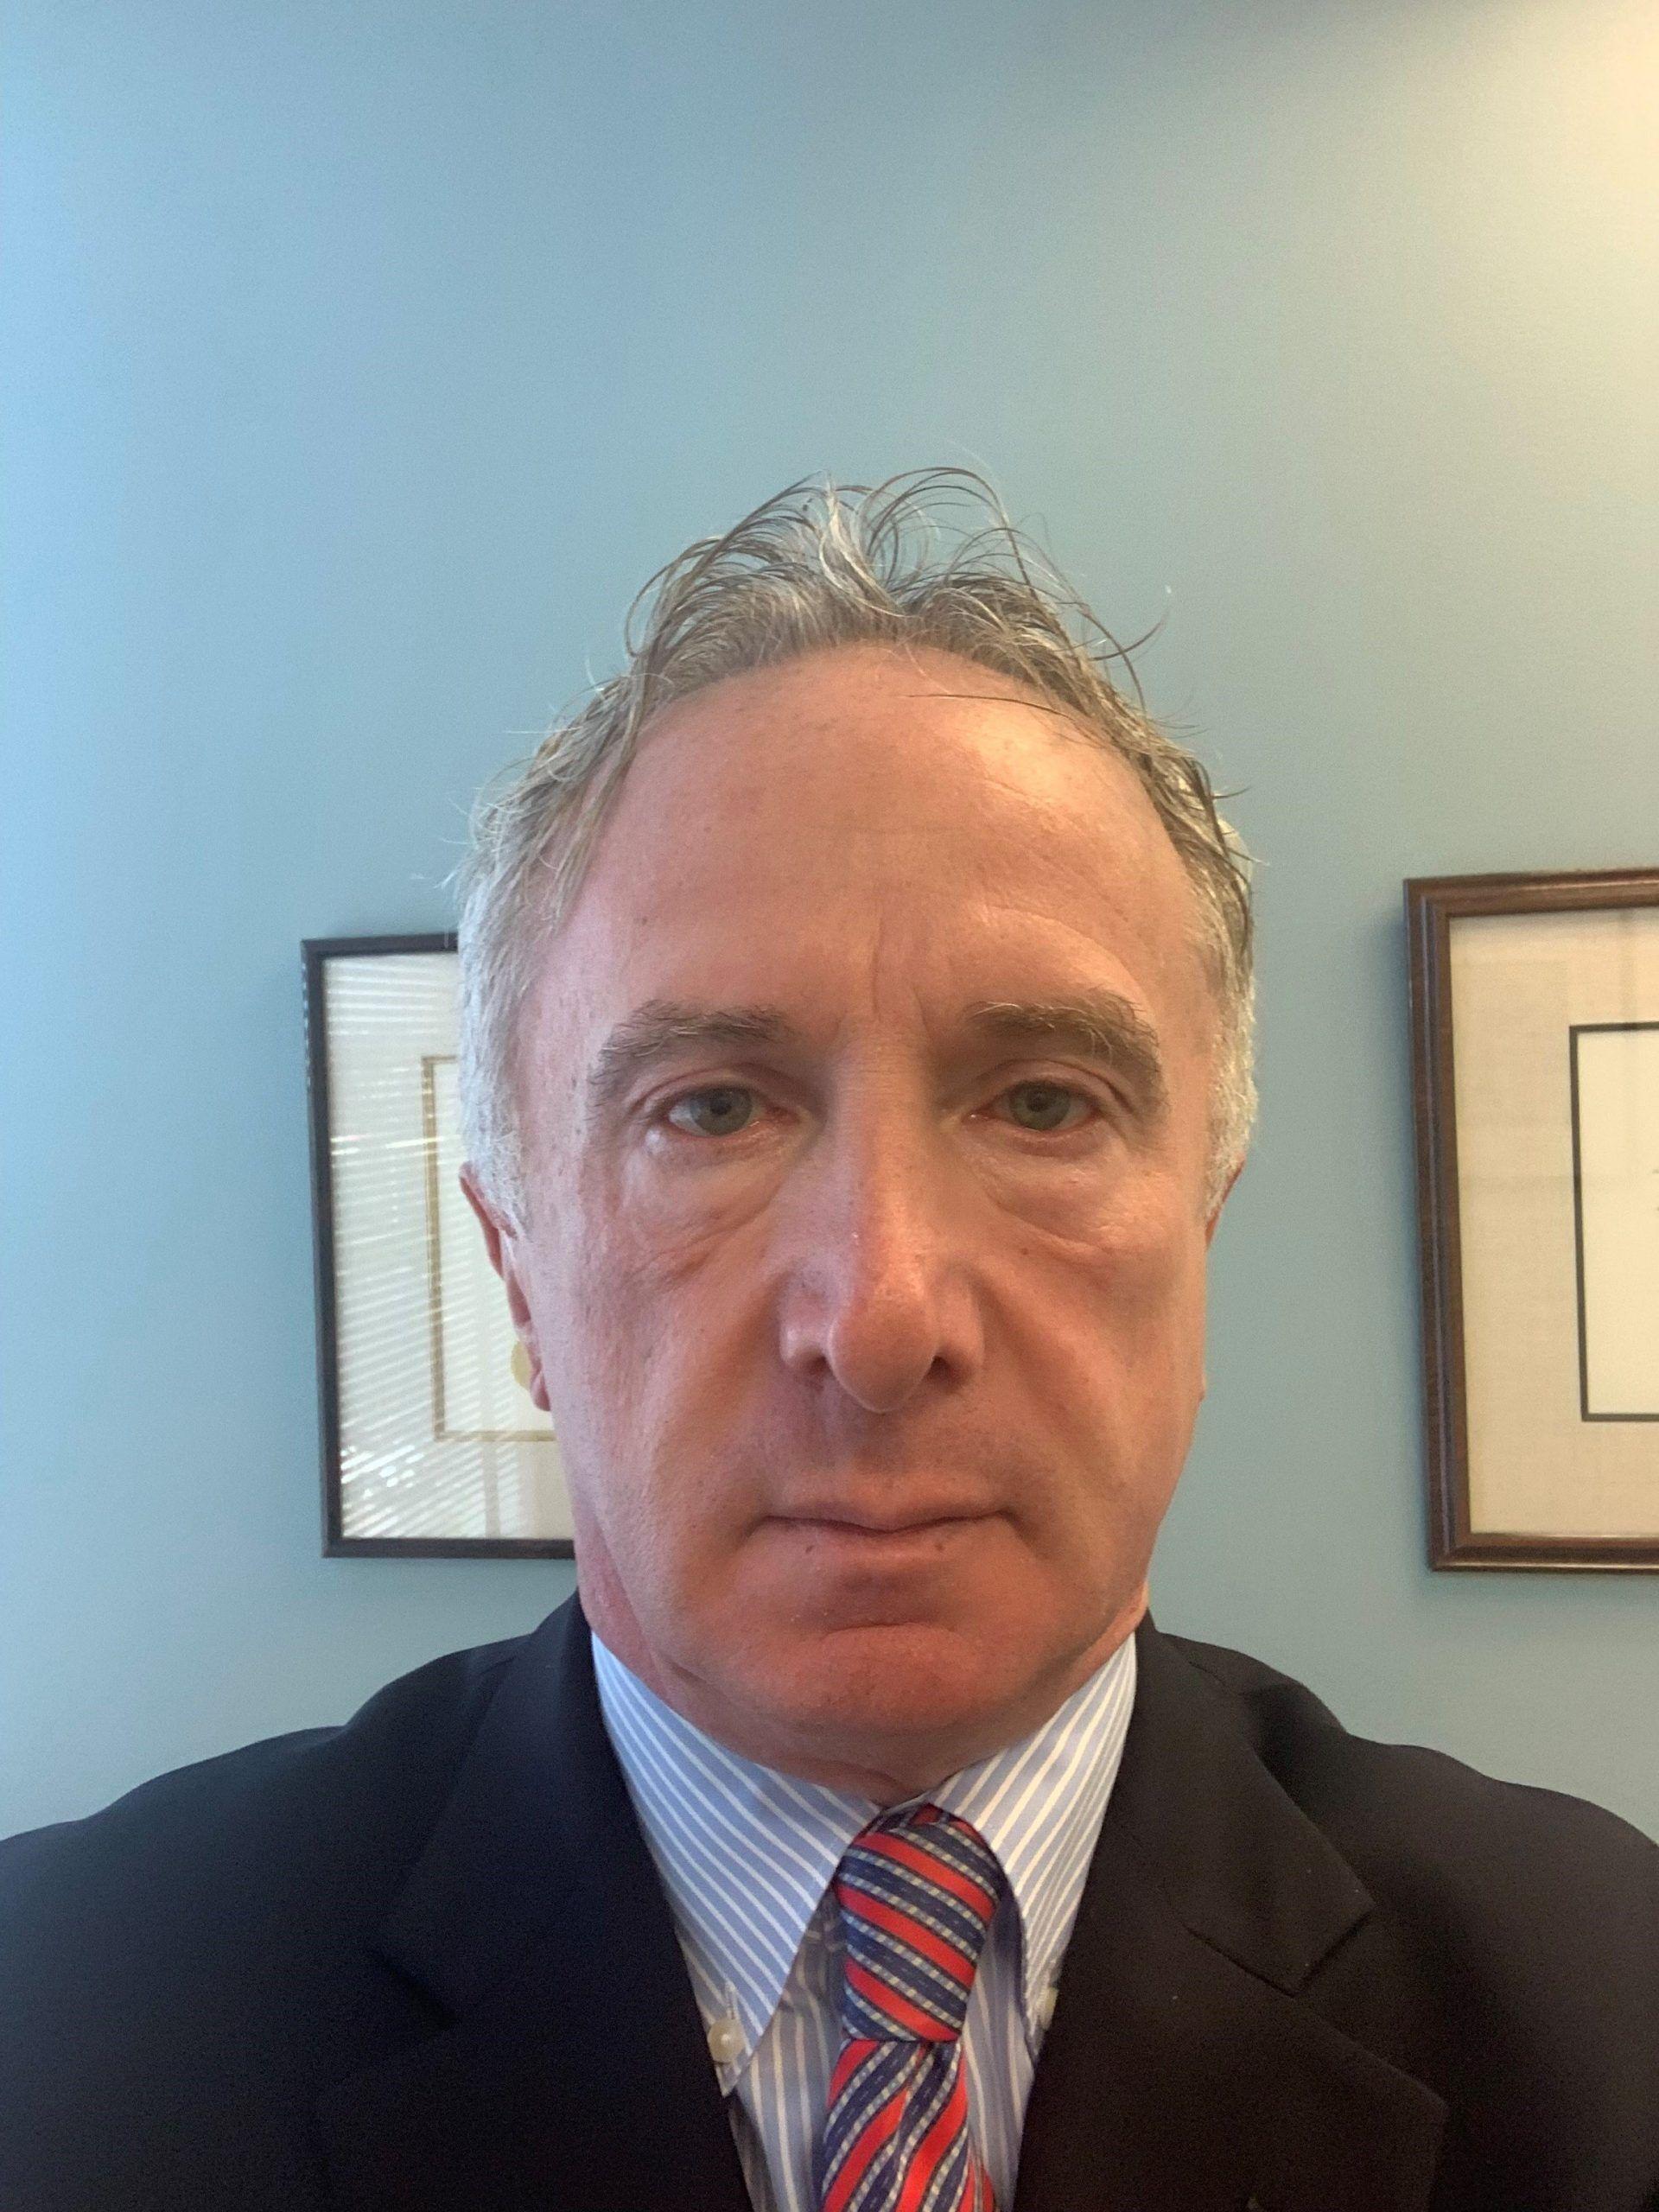 Miami Bankruptcy Lawyer Jordan Bublick